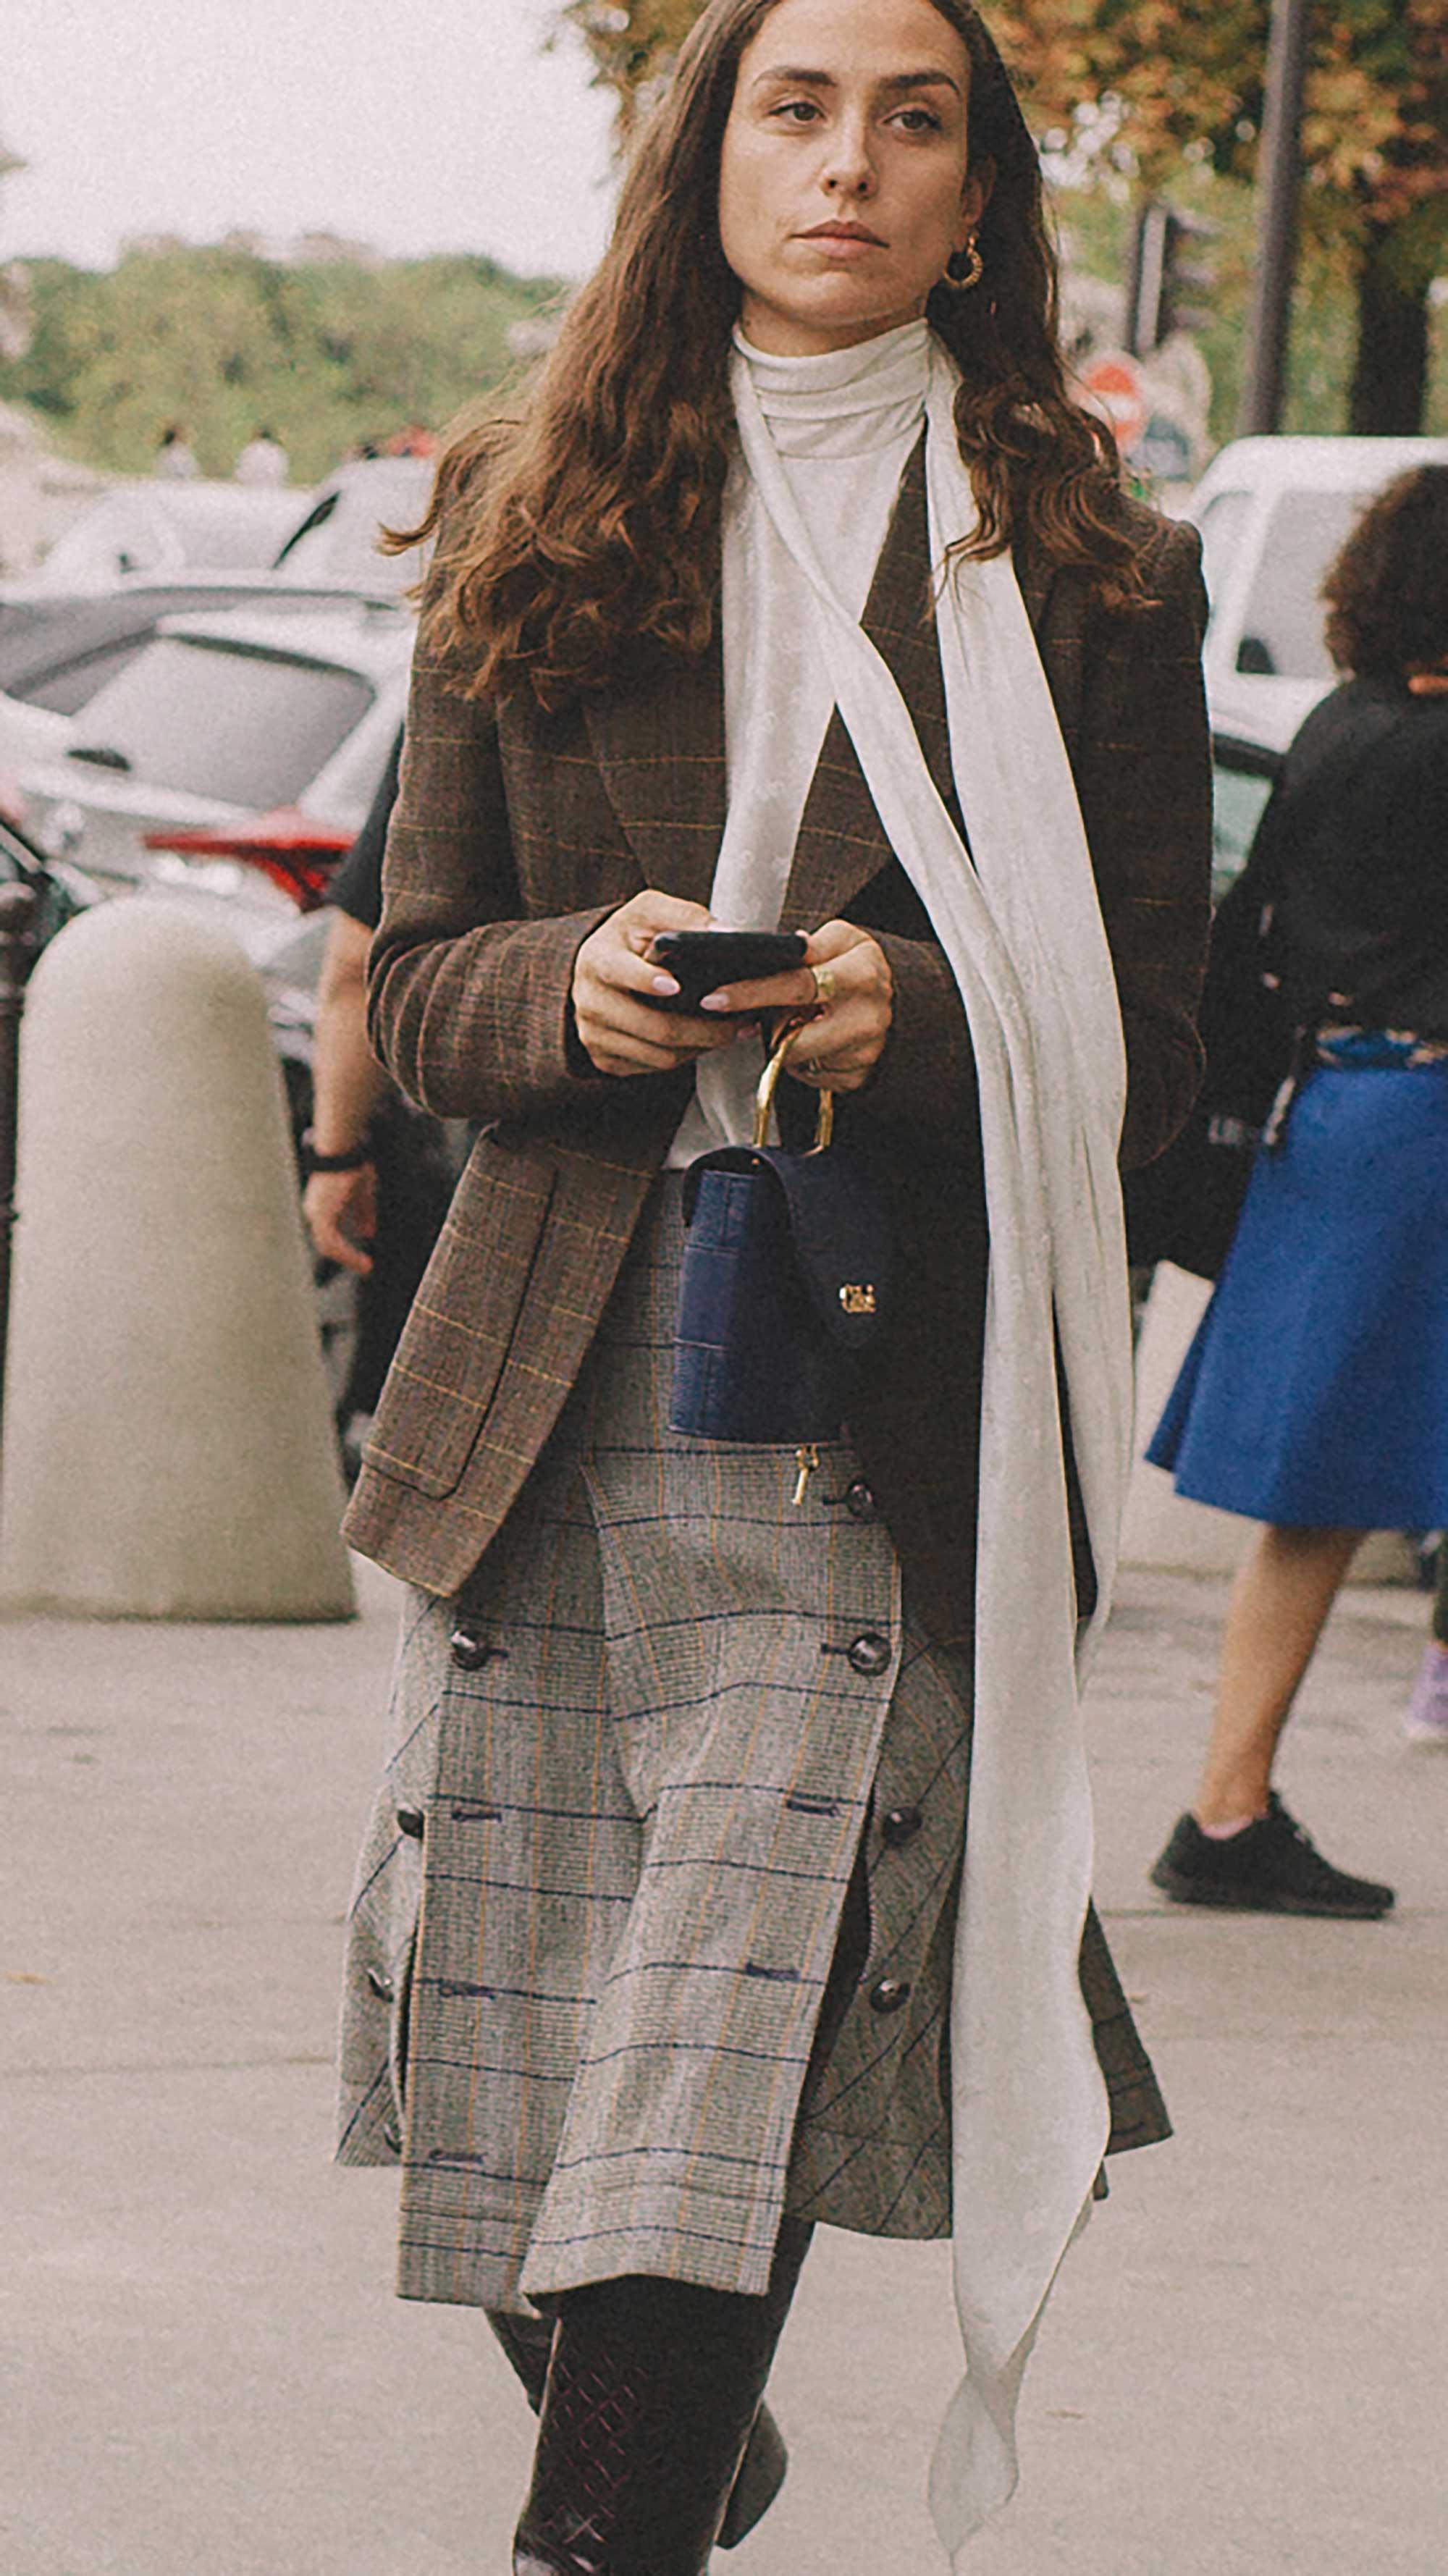 Best outfits of Paris Fashion Week street style 2019 day three PFW SS20 Photo by @J2martinez Jose J. Martinez -28.jpg